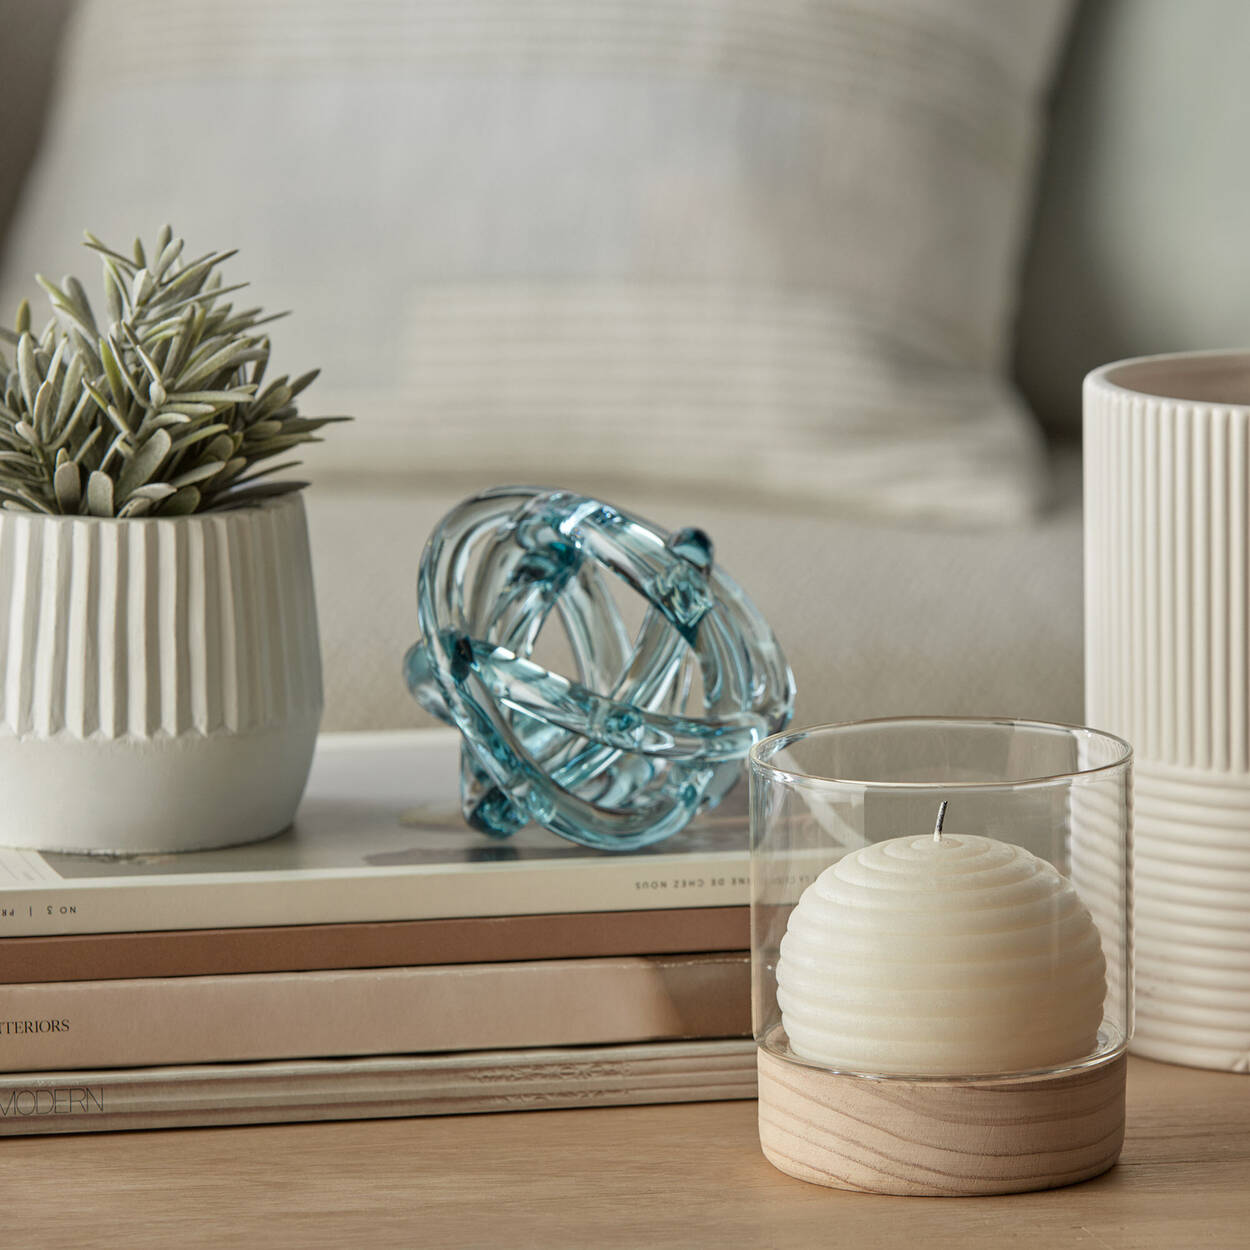 Artistic Aqua Glass Decor